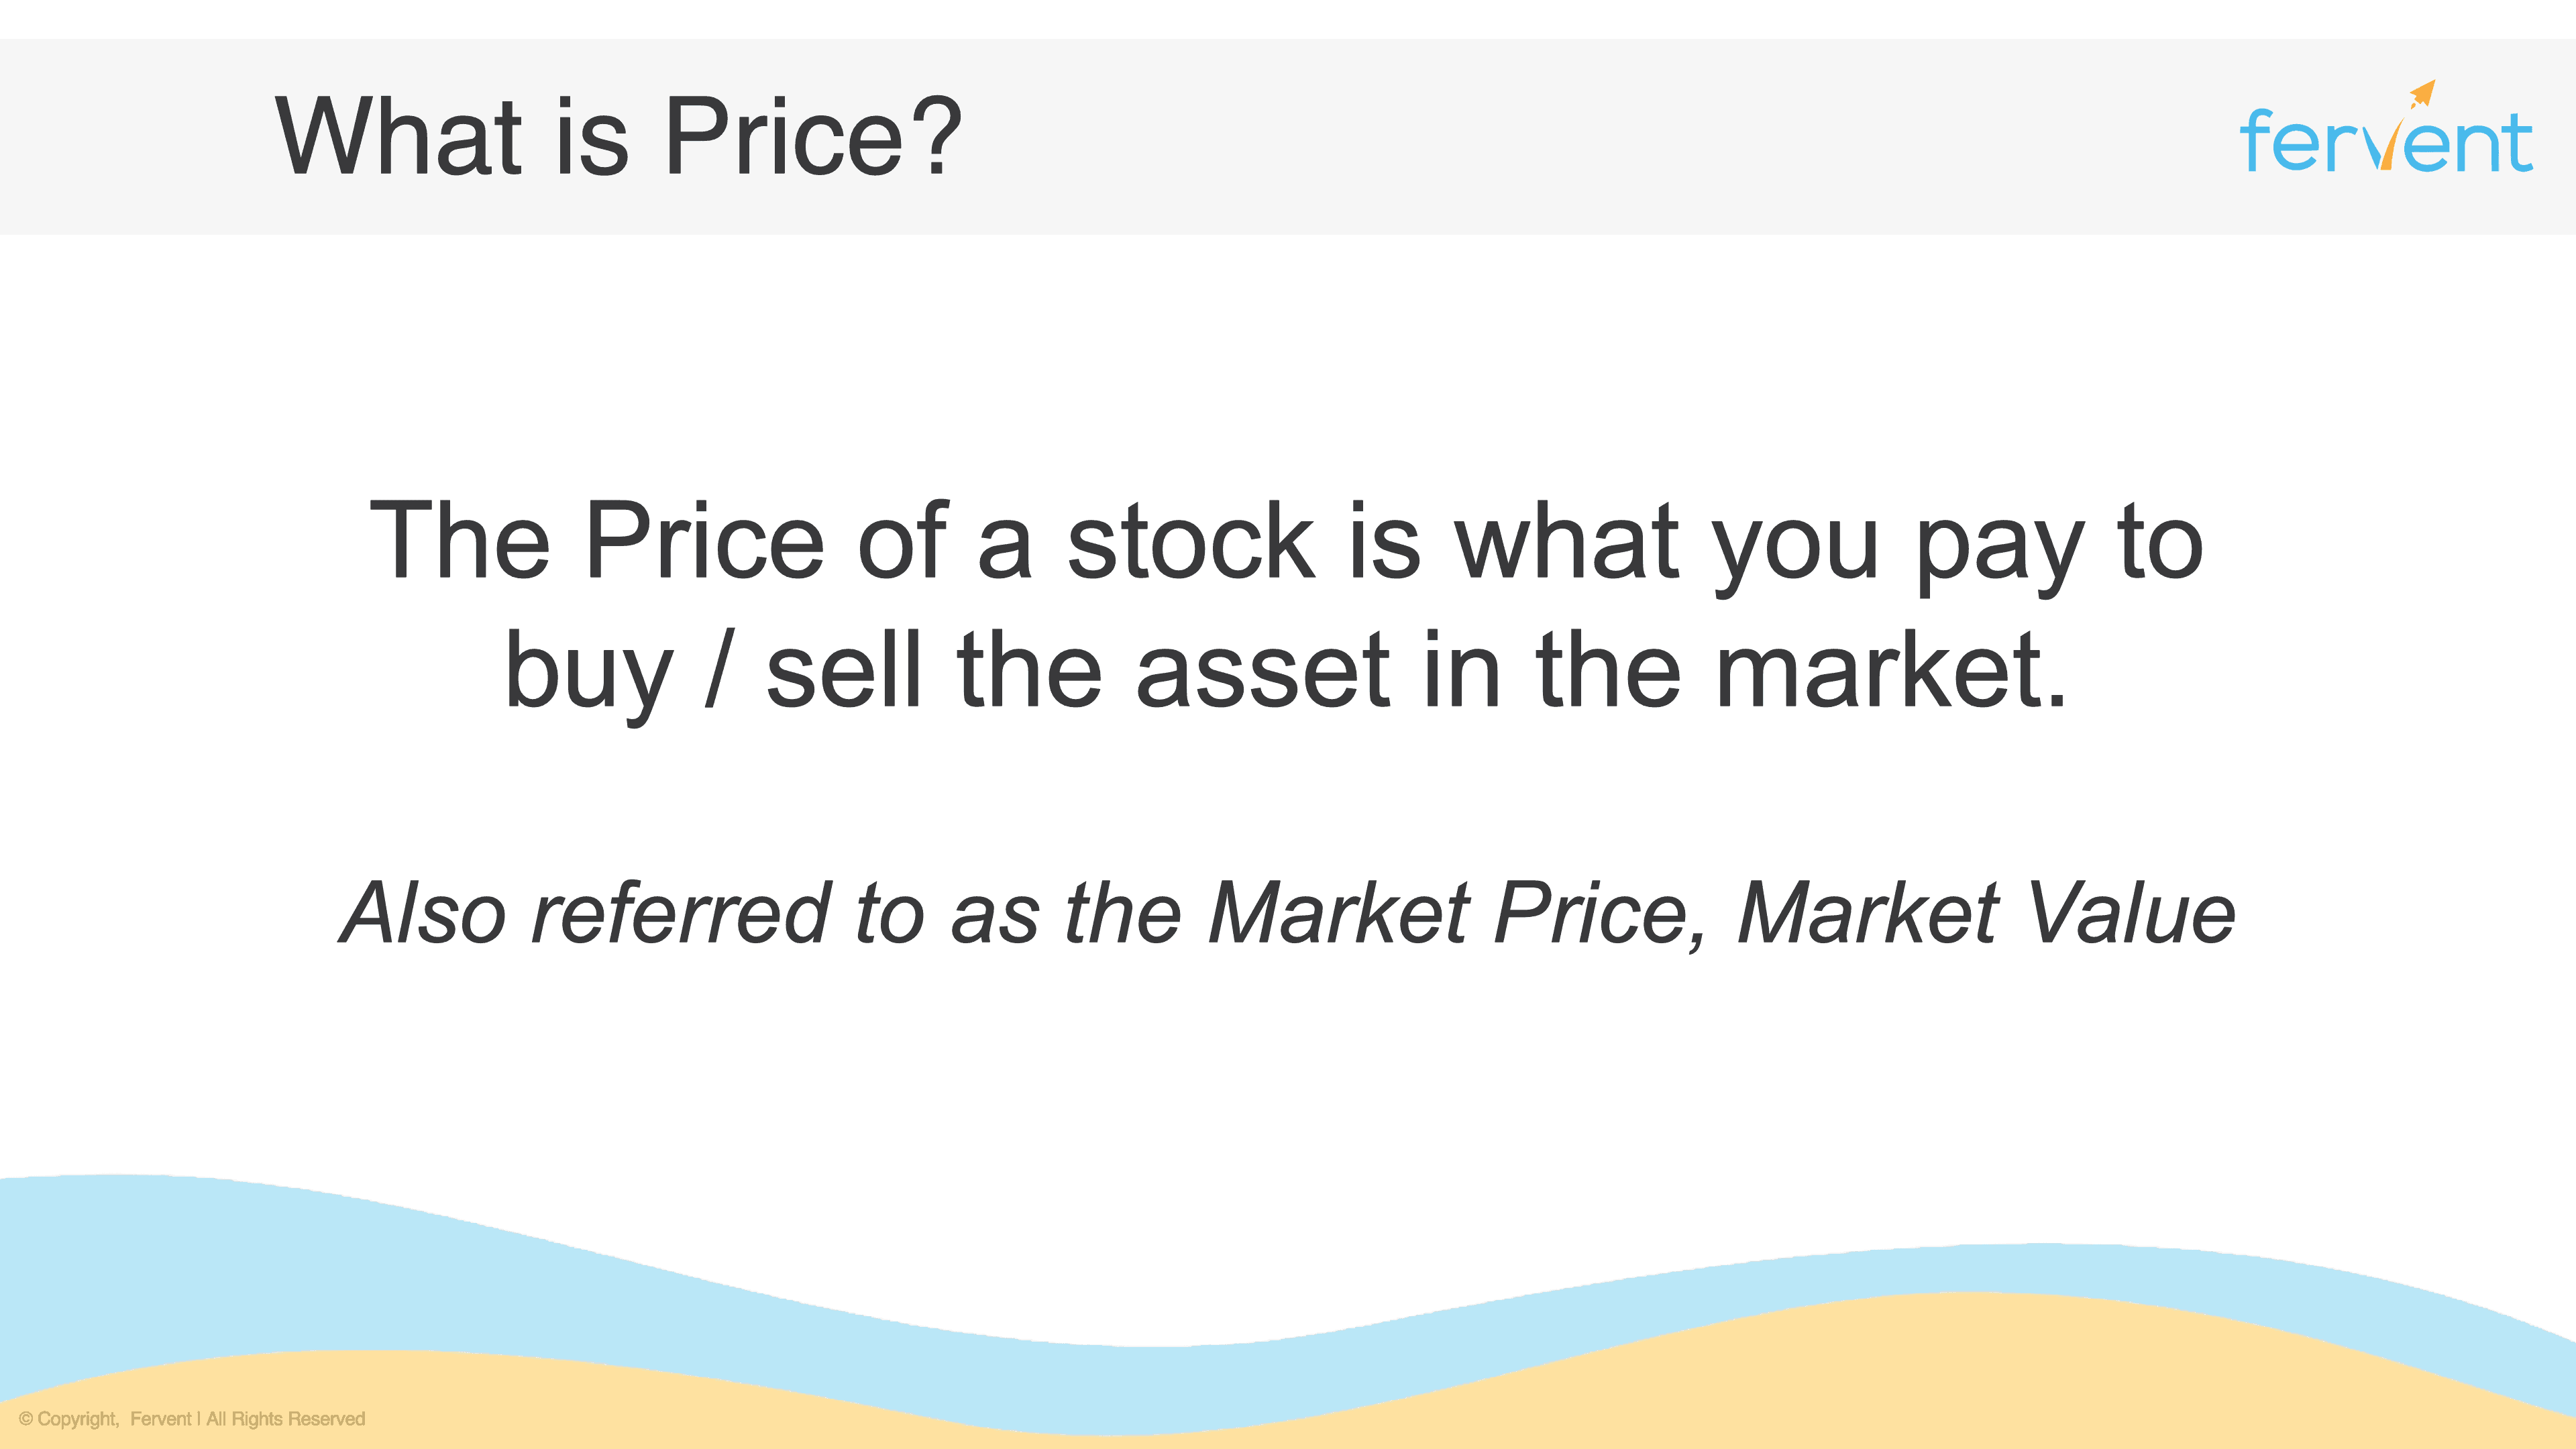 Slide explaining what Price is